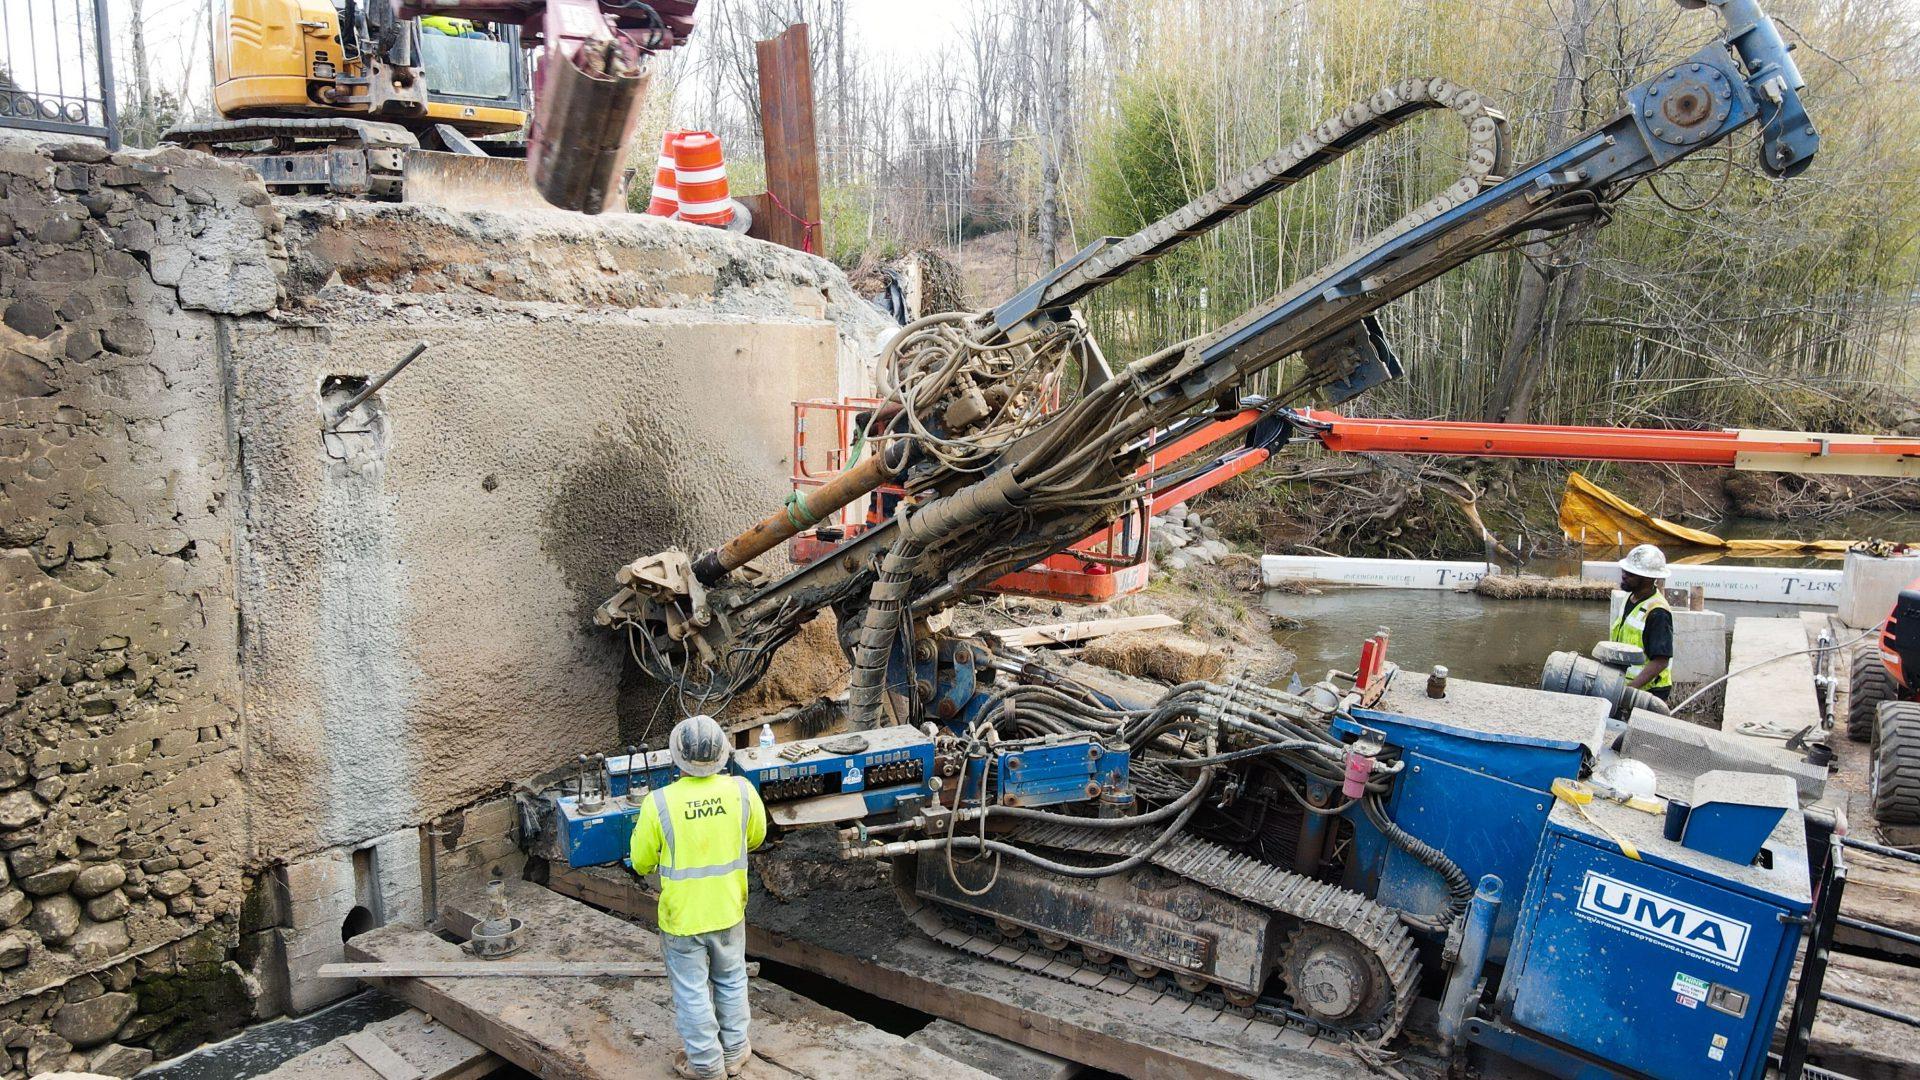 UMA Preserves Vital Retaining Wall Structures for N.C. Bridge Demolition Featured Image